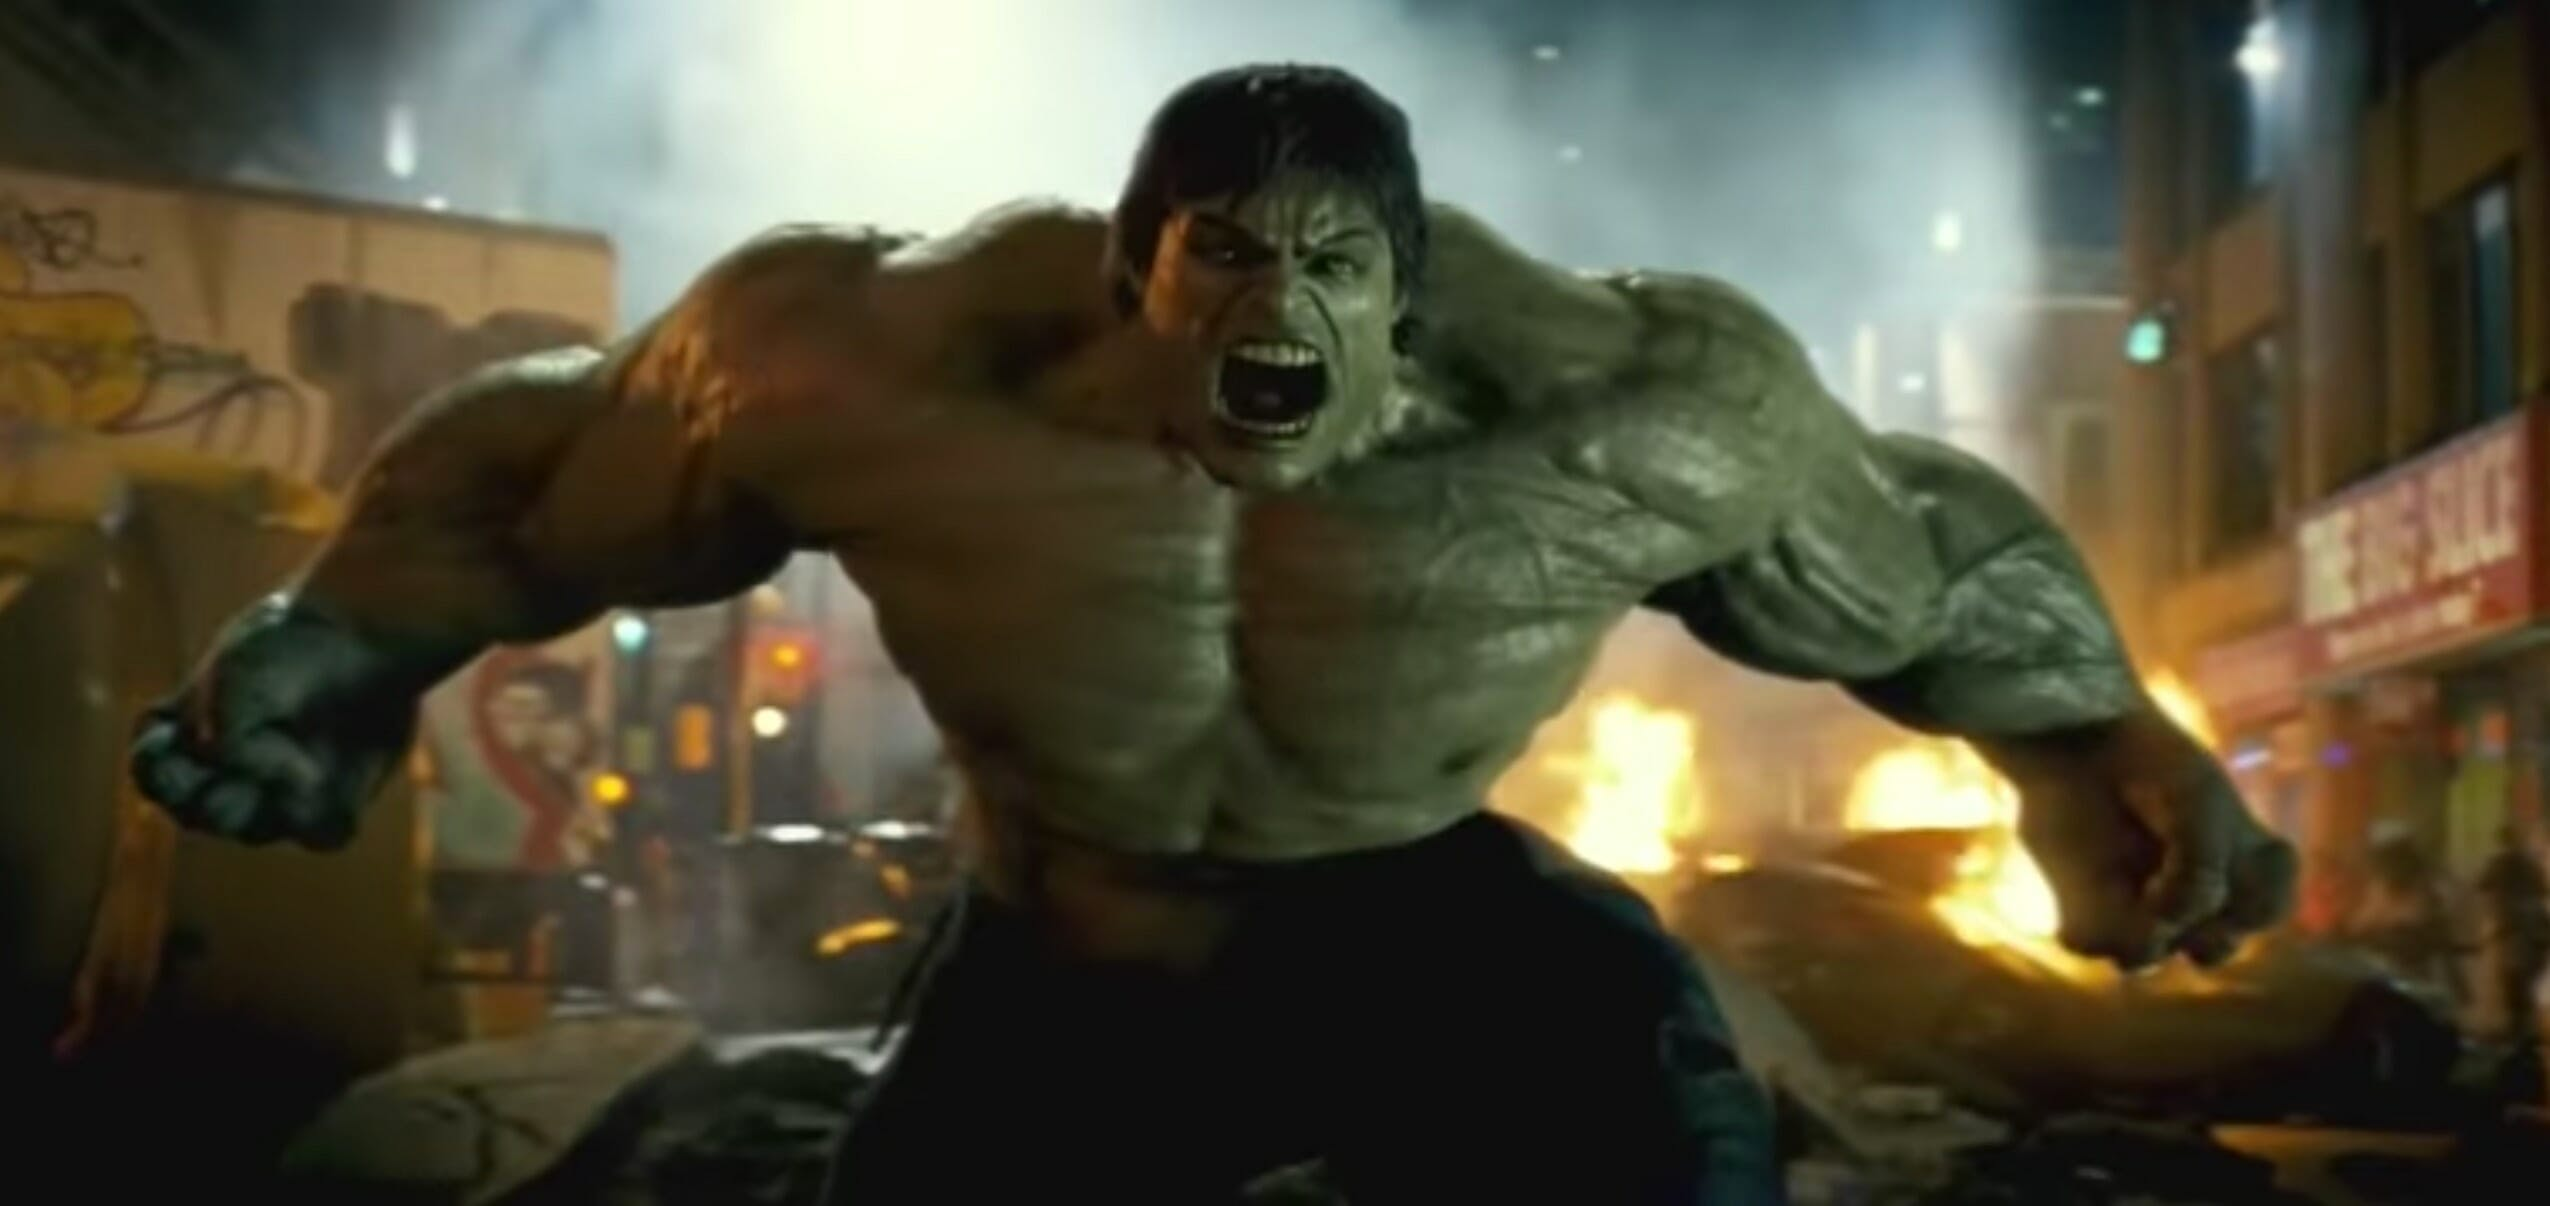 all mcu movies - incredible hulk